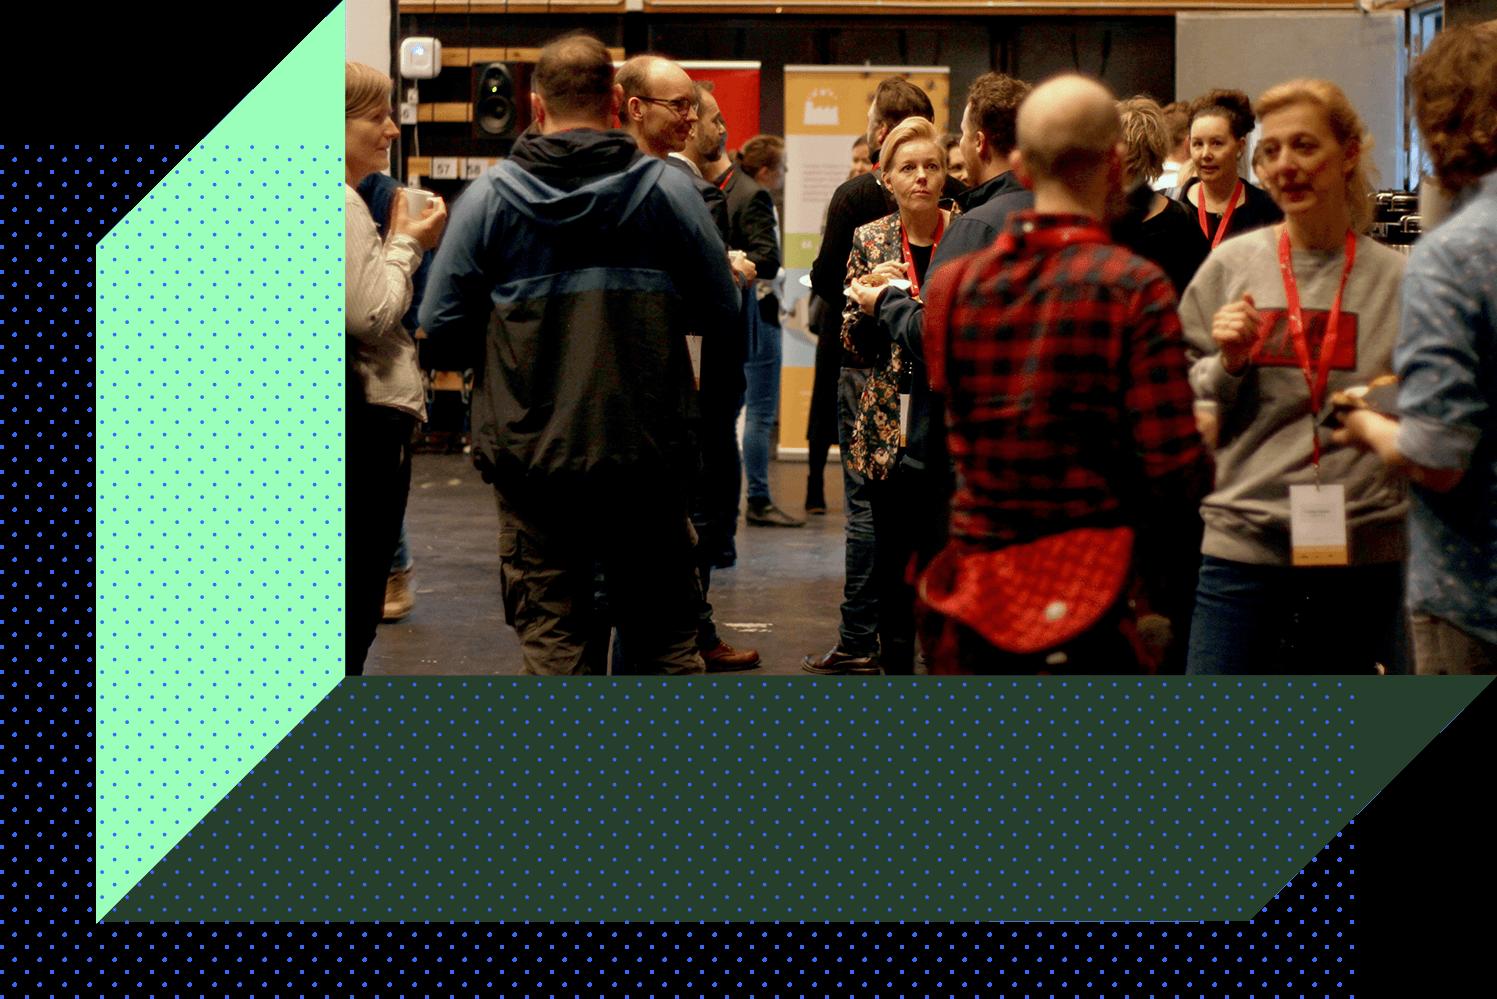 DKT_webImg_event2018_2.png